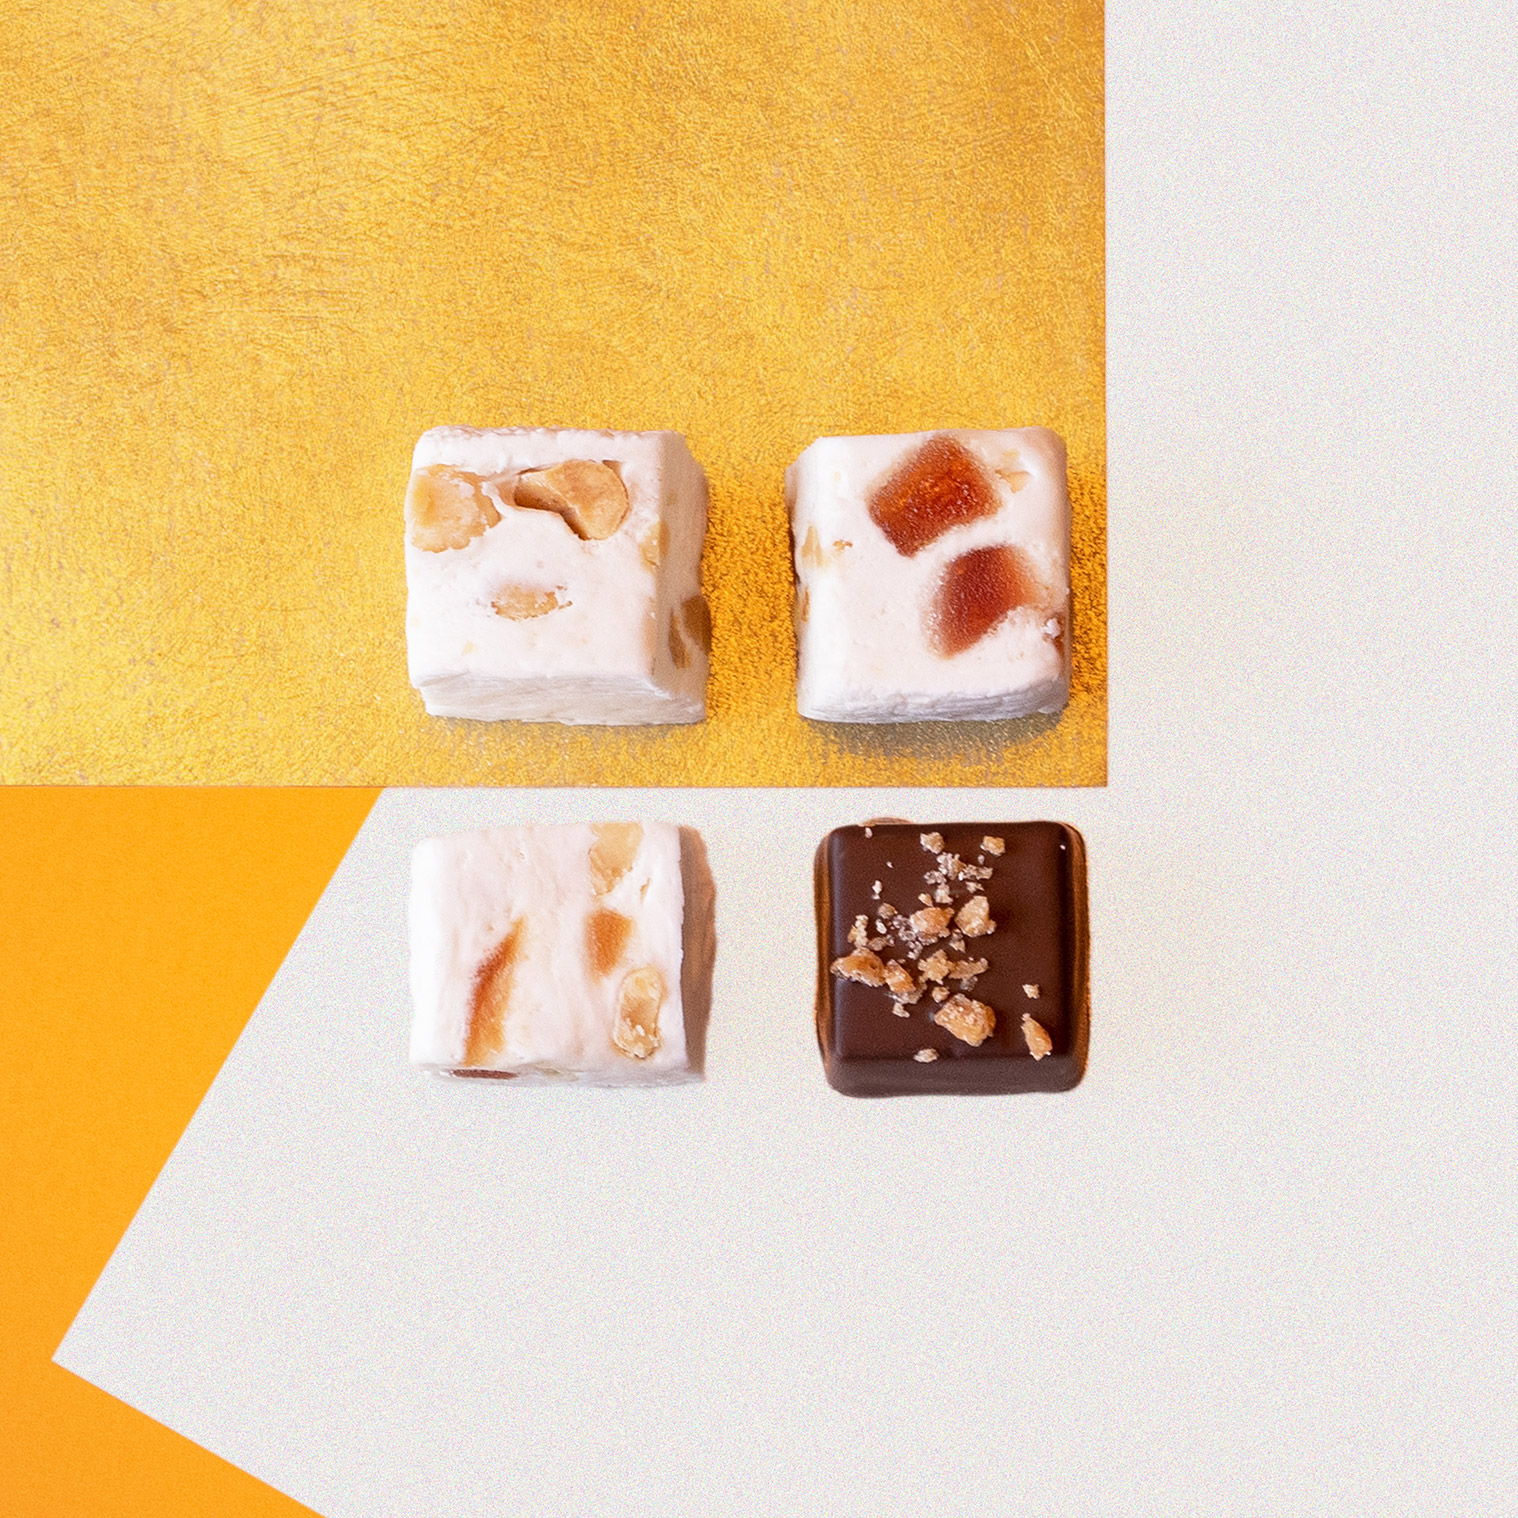 10-ChocolateSquare-15b